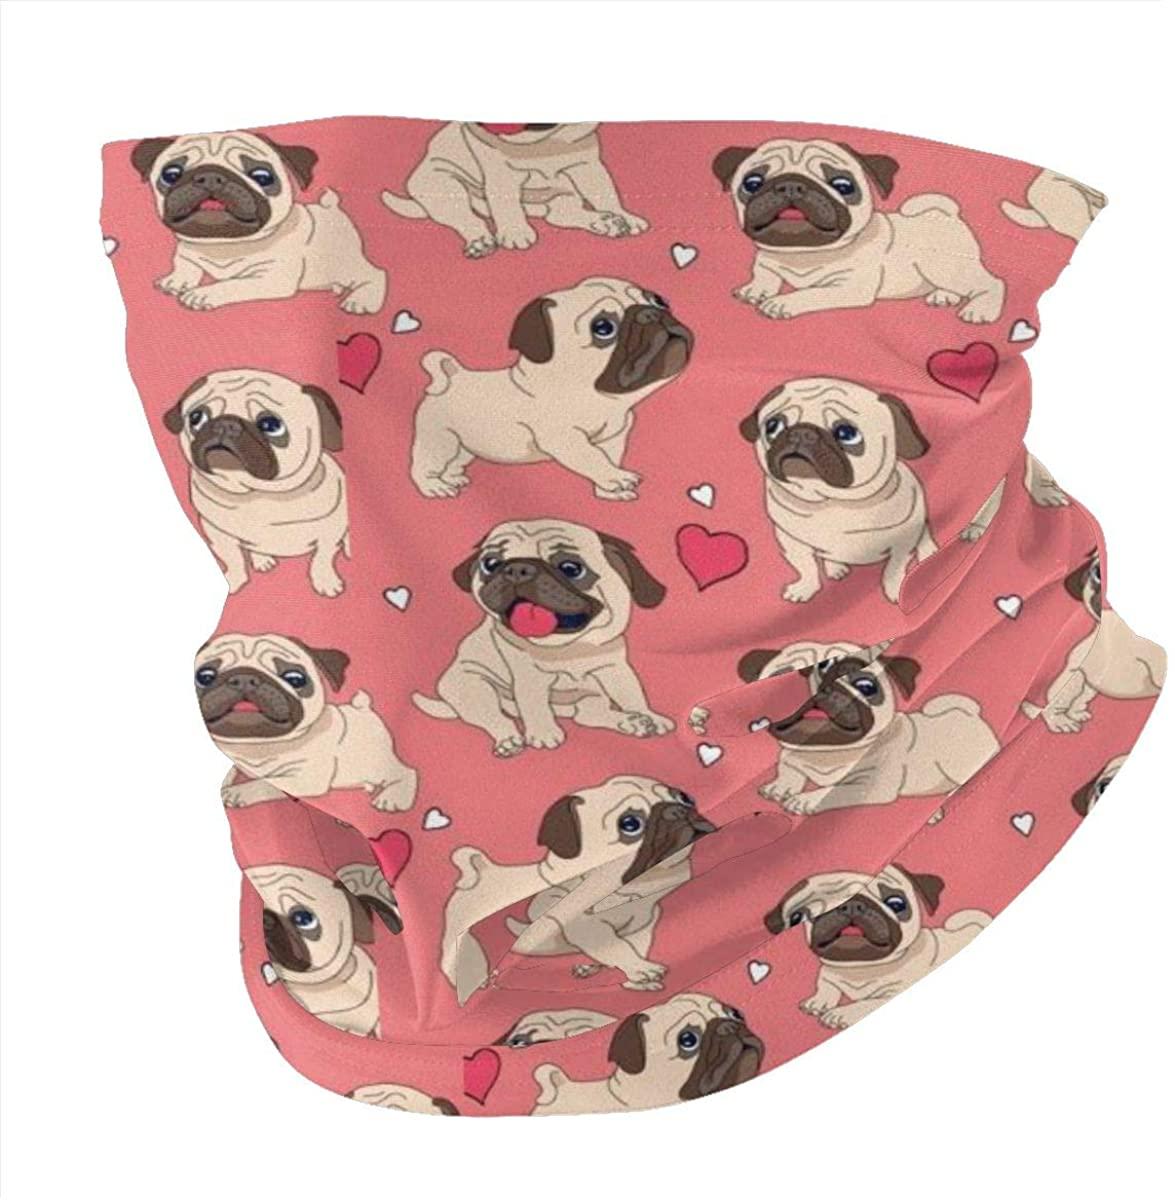 Valentine's Day Heart Pug Dog Face Mask Bandanas Multifunctional Unisex Headband Shield Scarf Neck Gaiters for Dust, Outdoors, Festivals, Sports Black